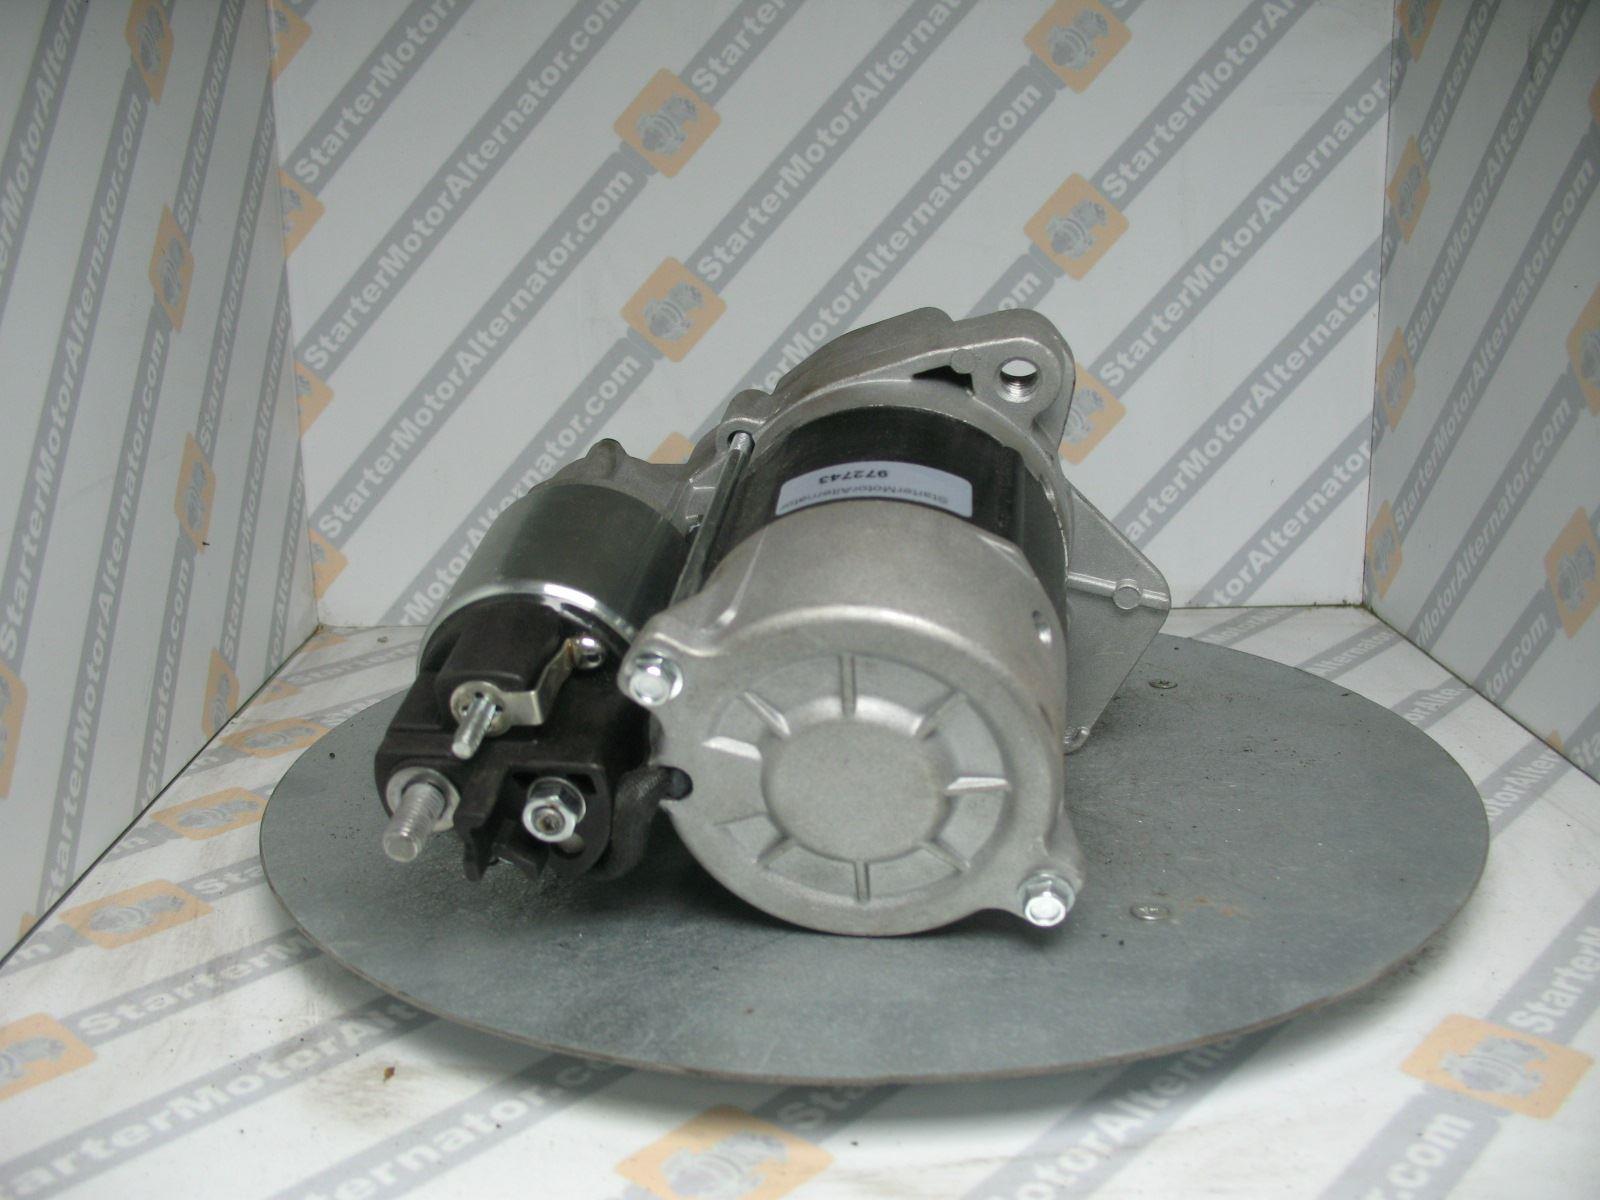 XIY3814 Starter Motor For Dacia / Renault / Smart